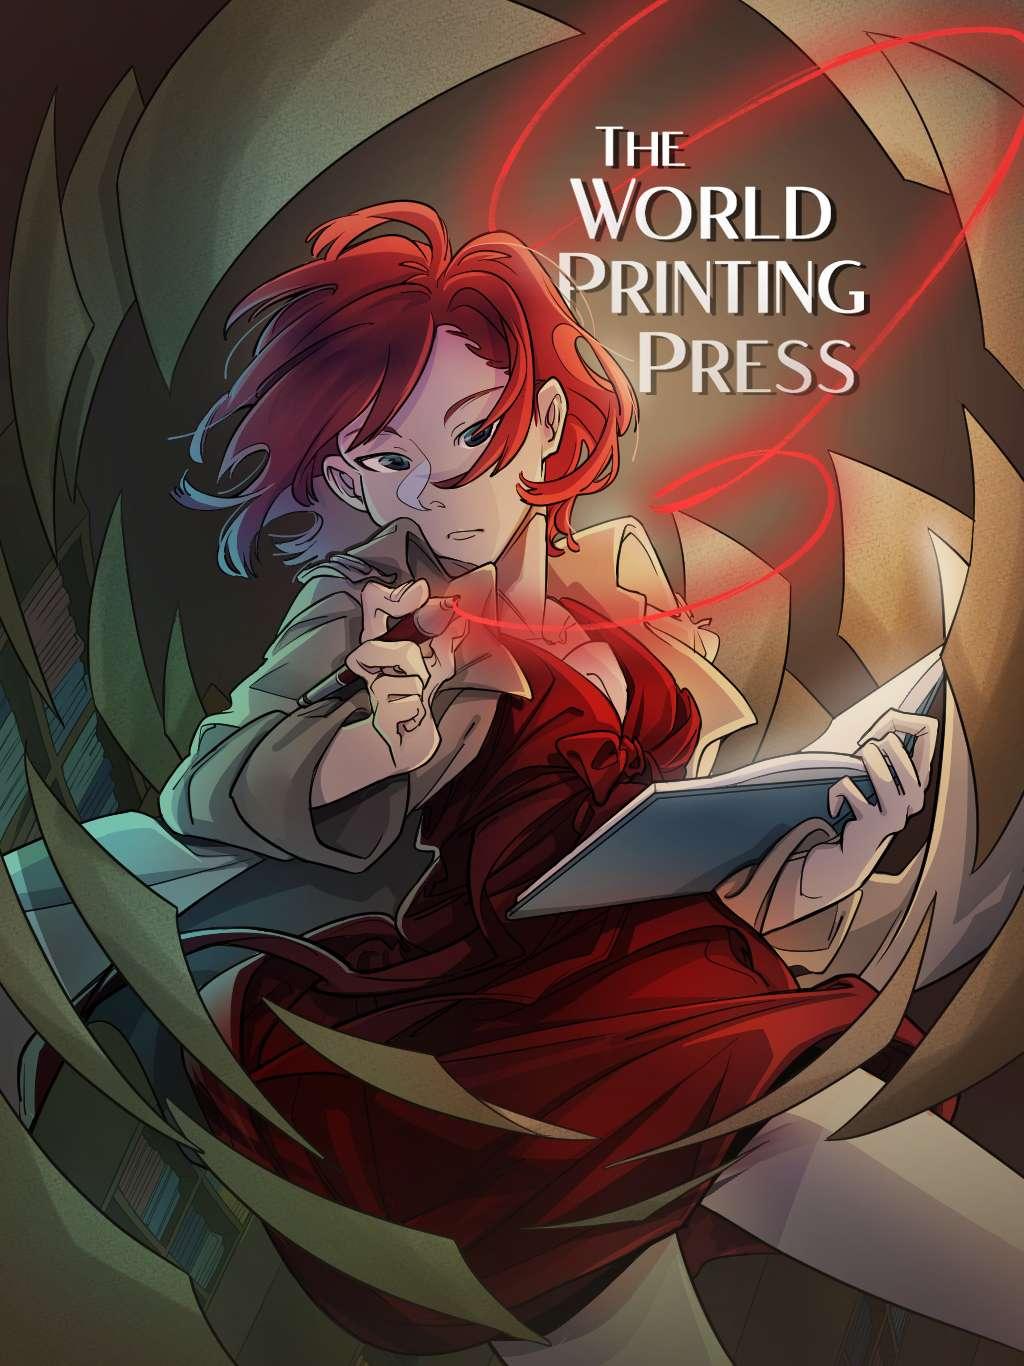 the World Printing Press